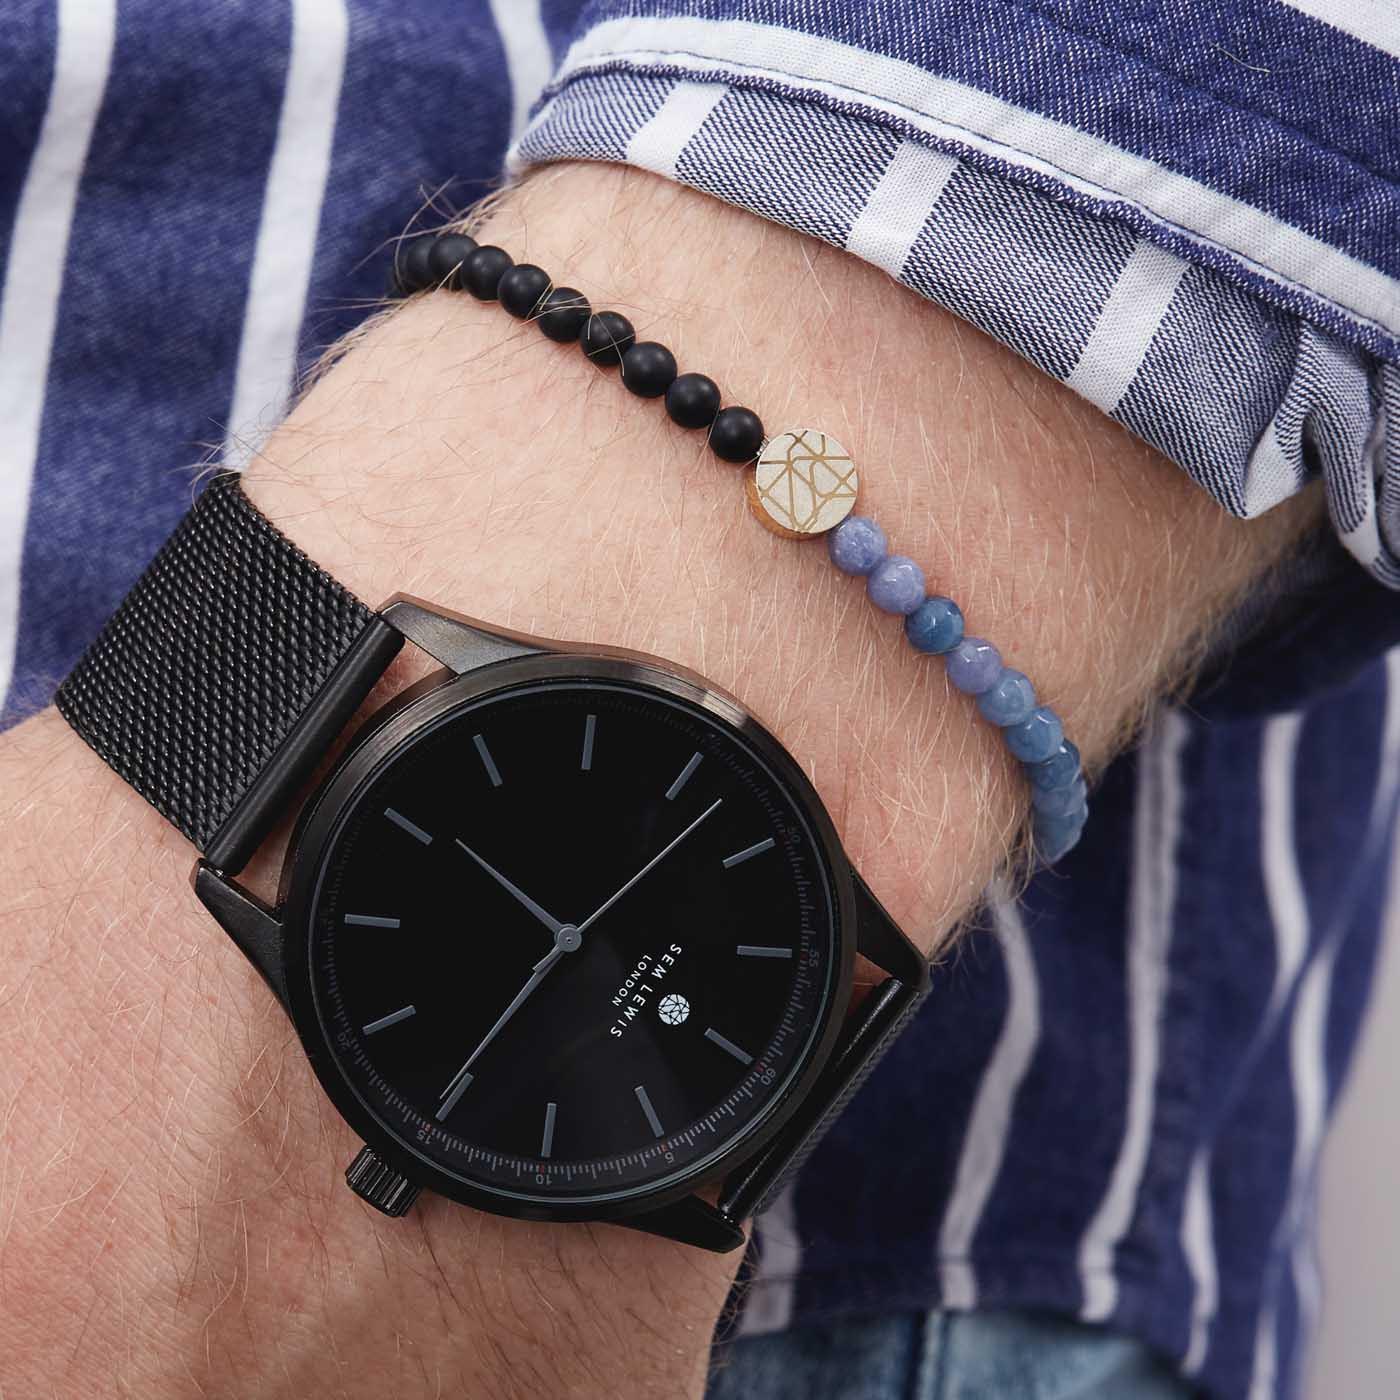 Sem Lewis 4mm Piccadilly King's Cross St. Pancras Armband SL220003 (Lengte: 17.50-19.50 cm)